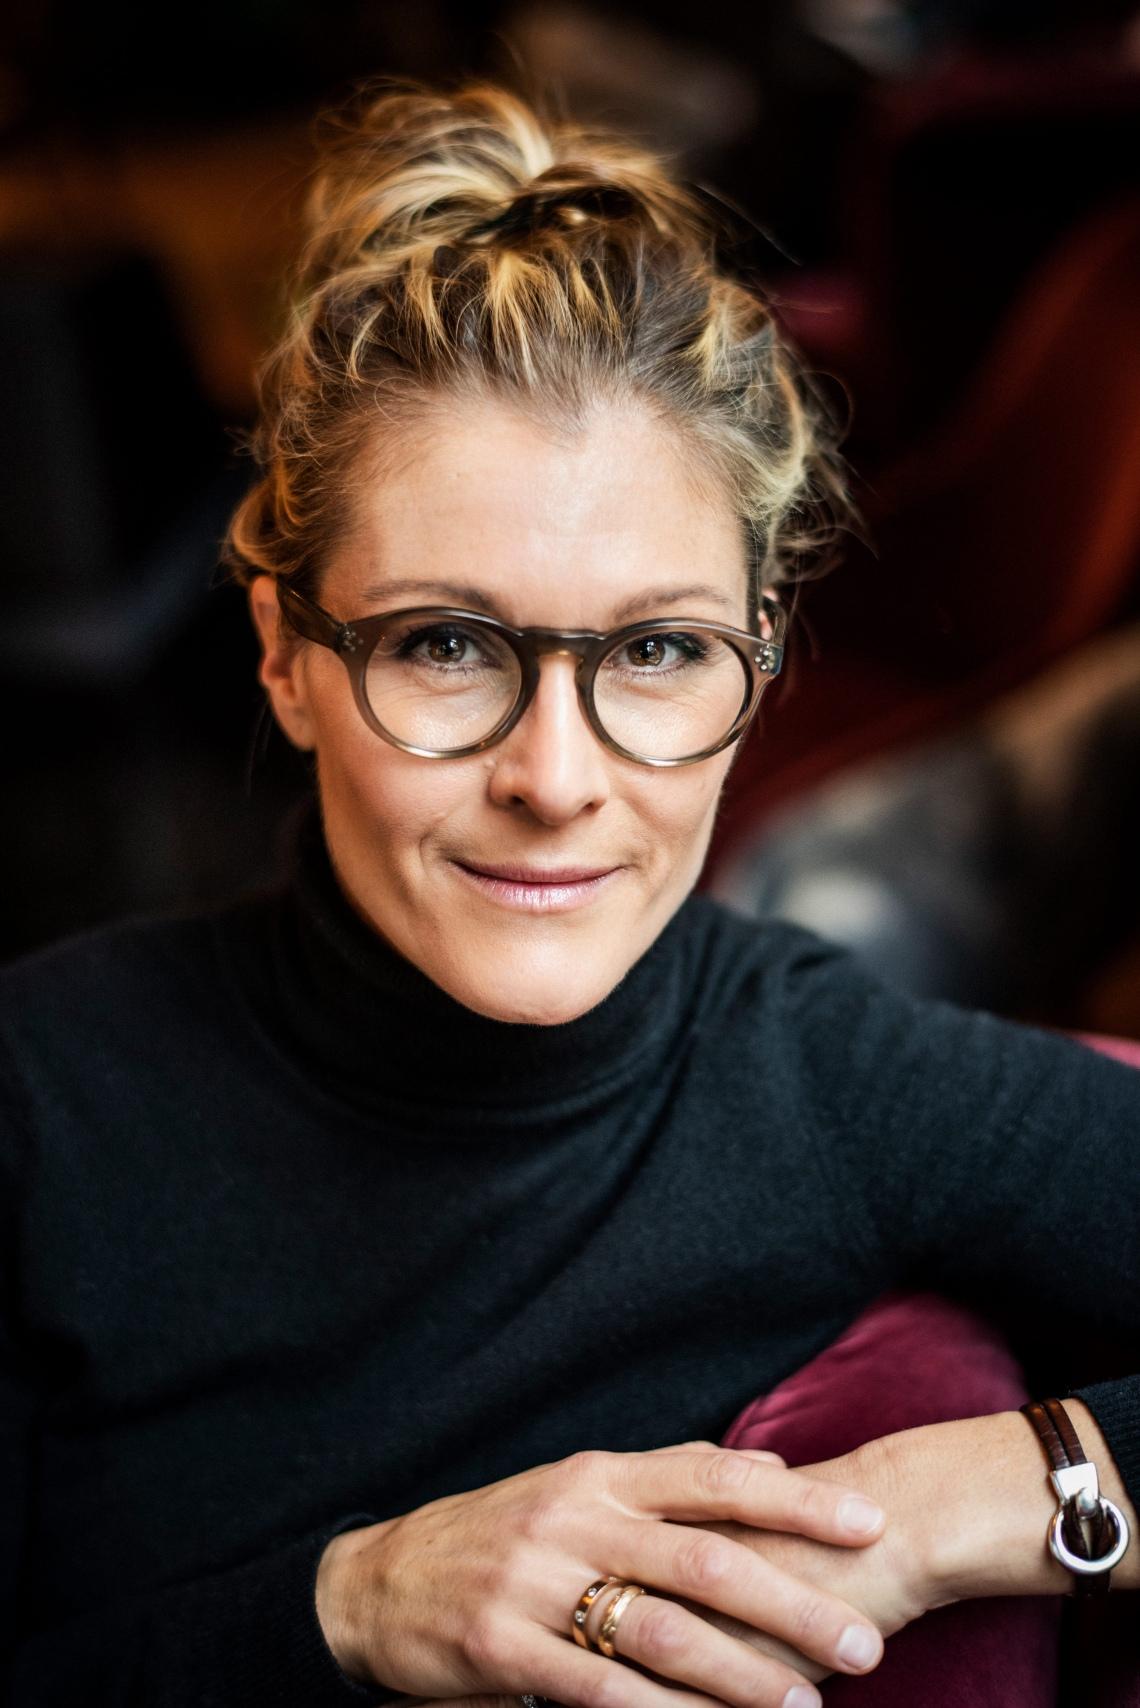 Lotta_Skoglund_Eva Lindbladwebb